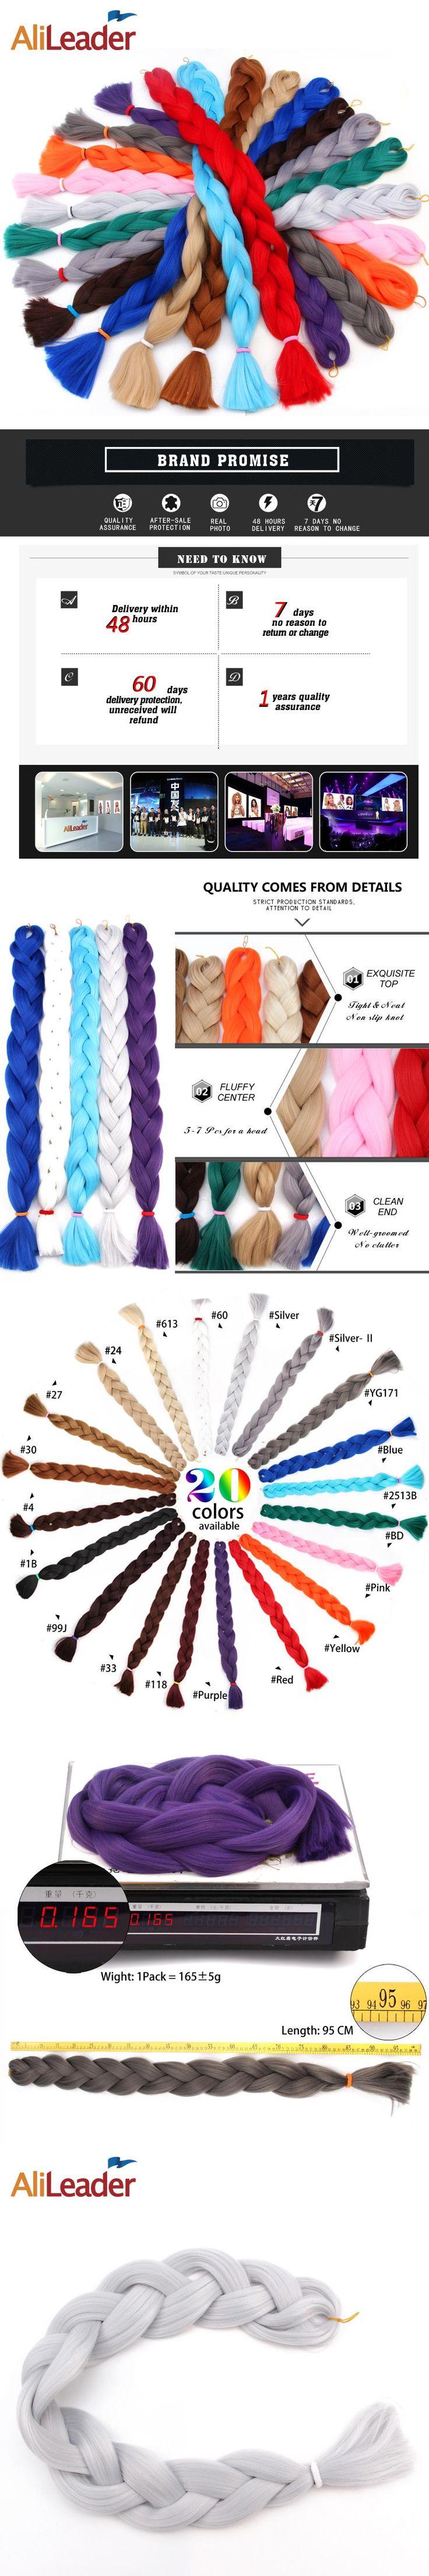 AliLeader Kanekalon Braiding Hair Crochet Twist Jumbo Braids Synthetic Hair Weave 36 Inch  165 Gram 1-10pcs/Lot Purple Pink Blue